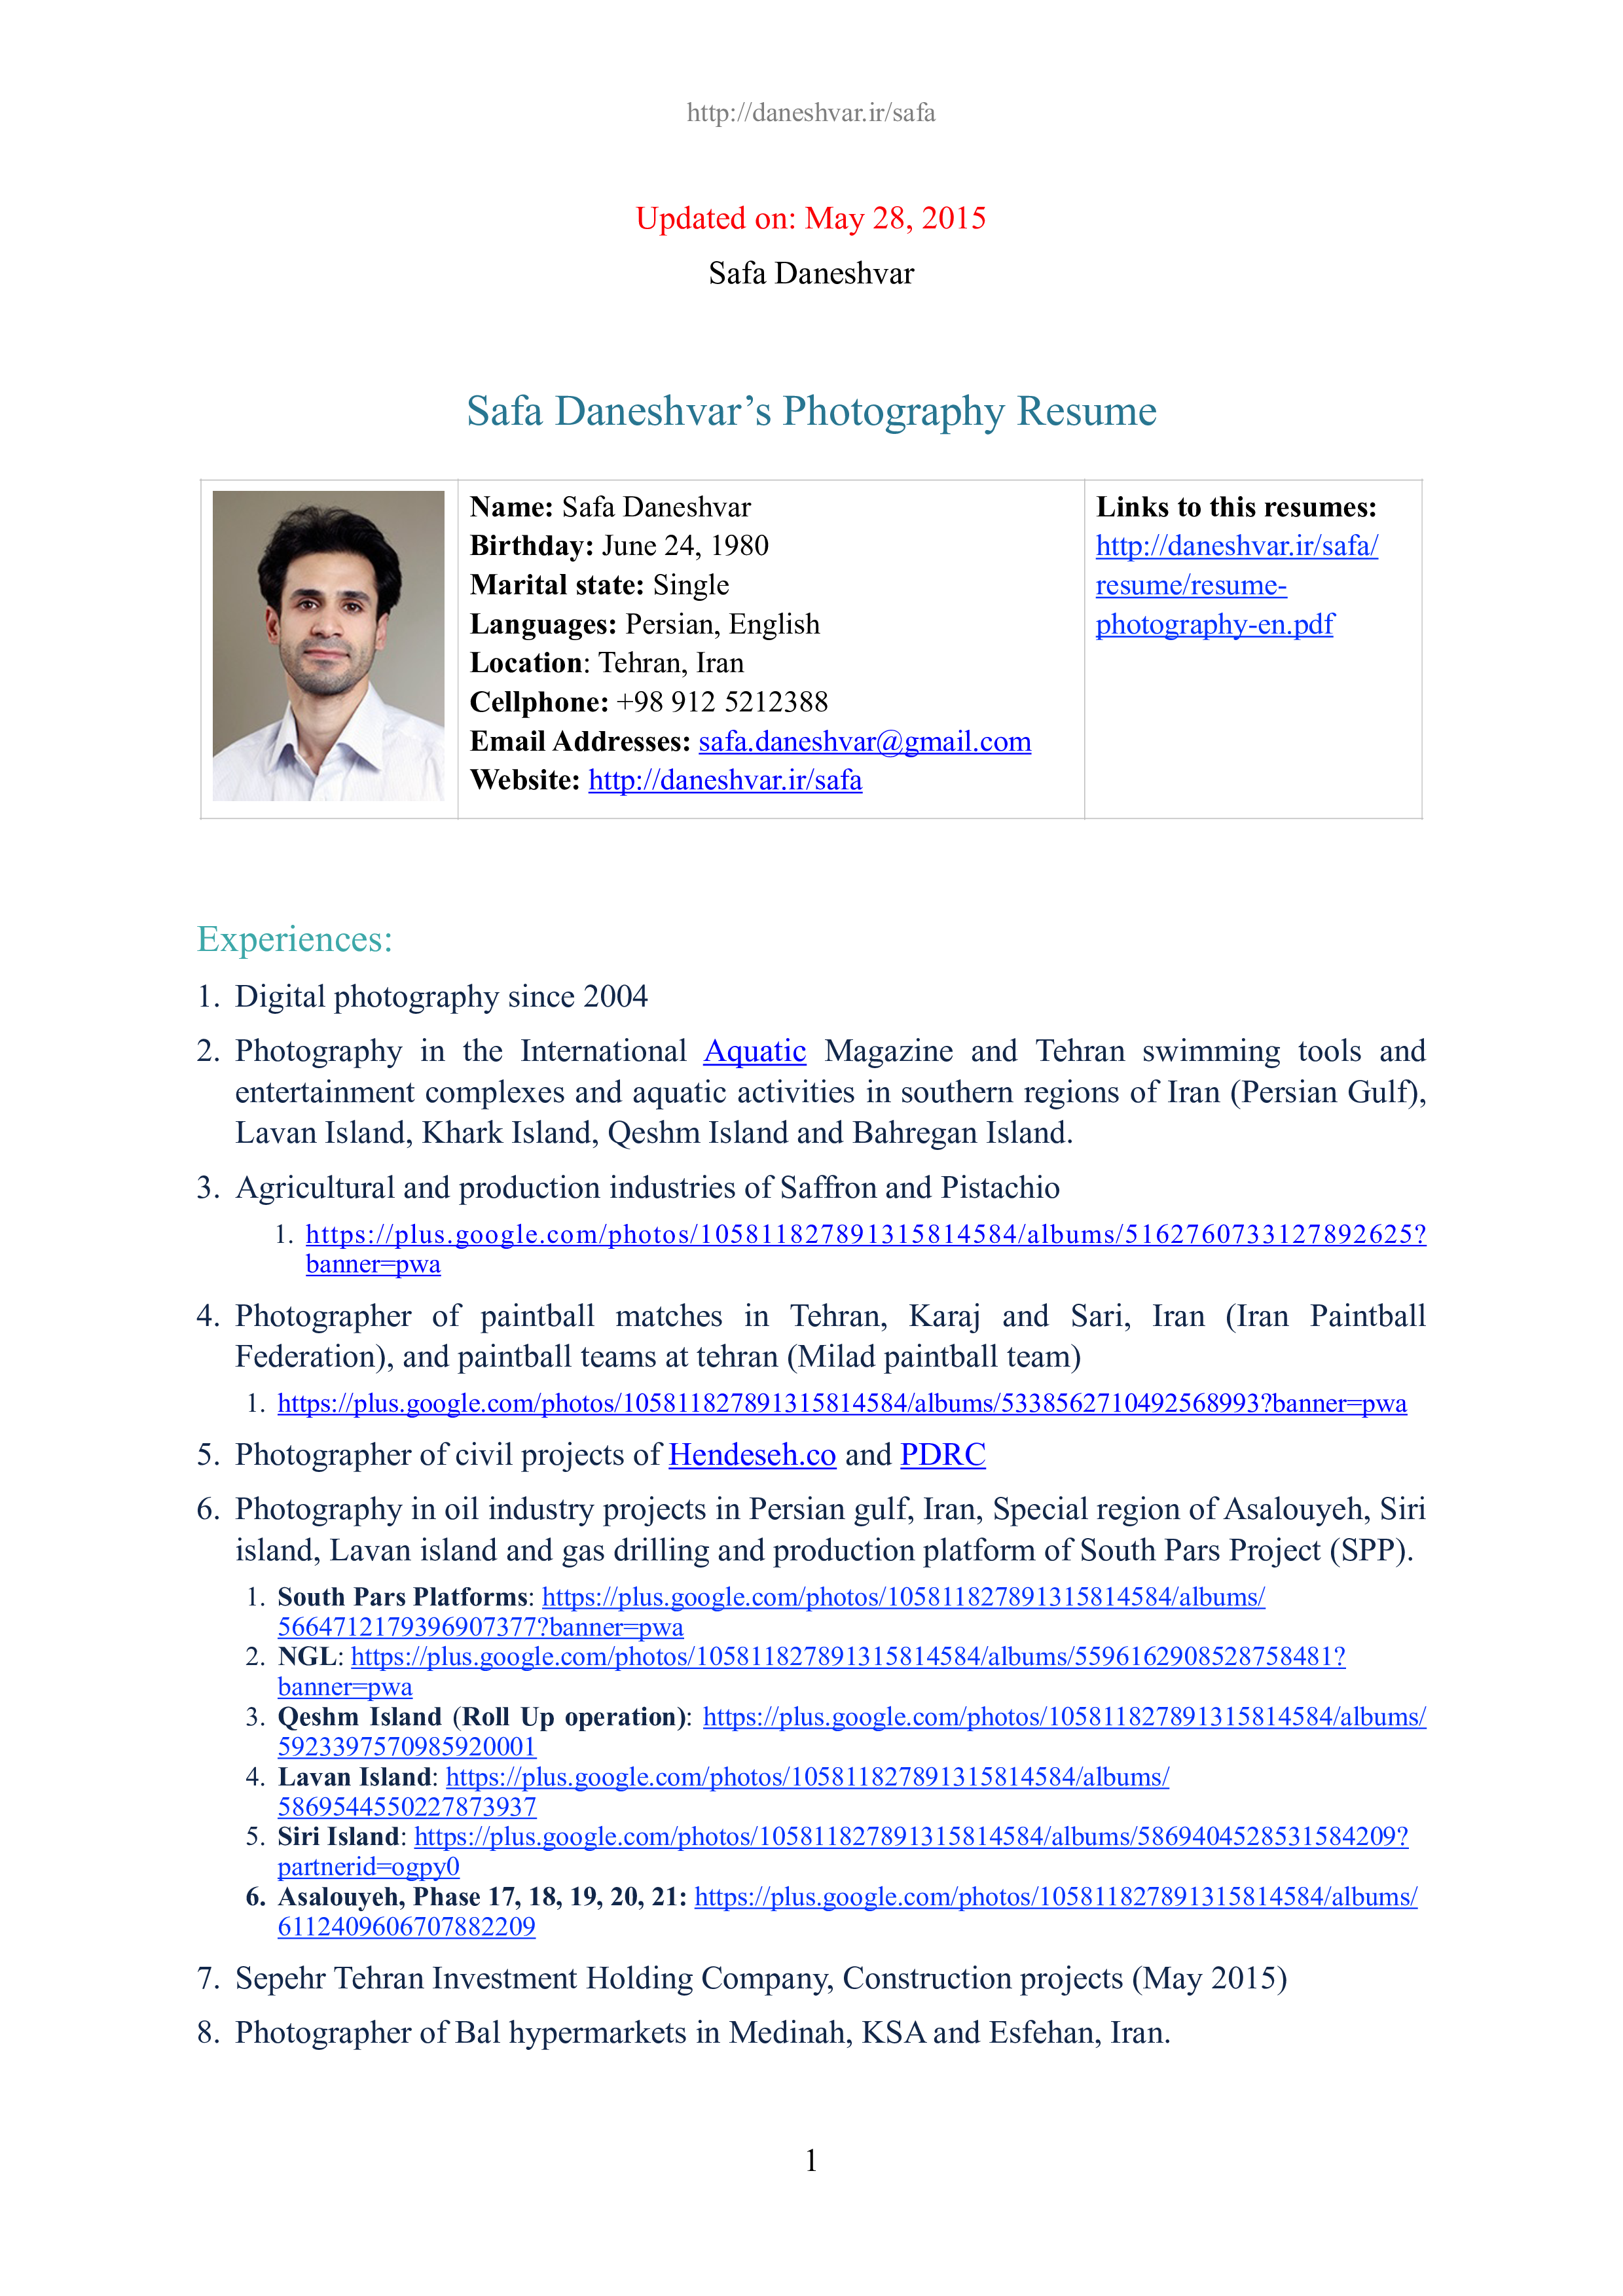 Free Digital Photographer Resume | Templates at allbusinesstemplates.com